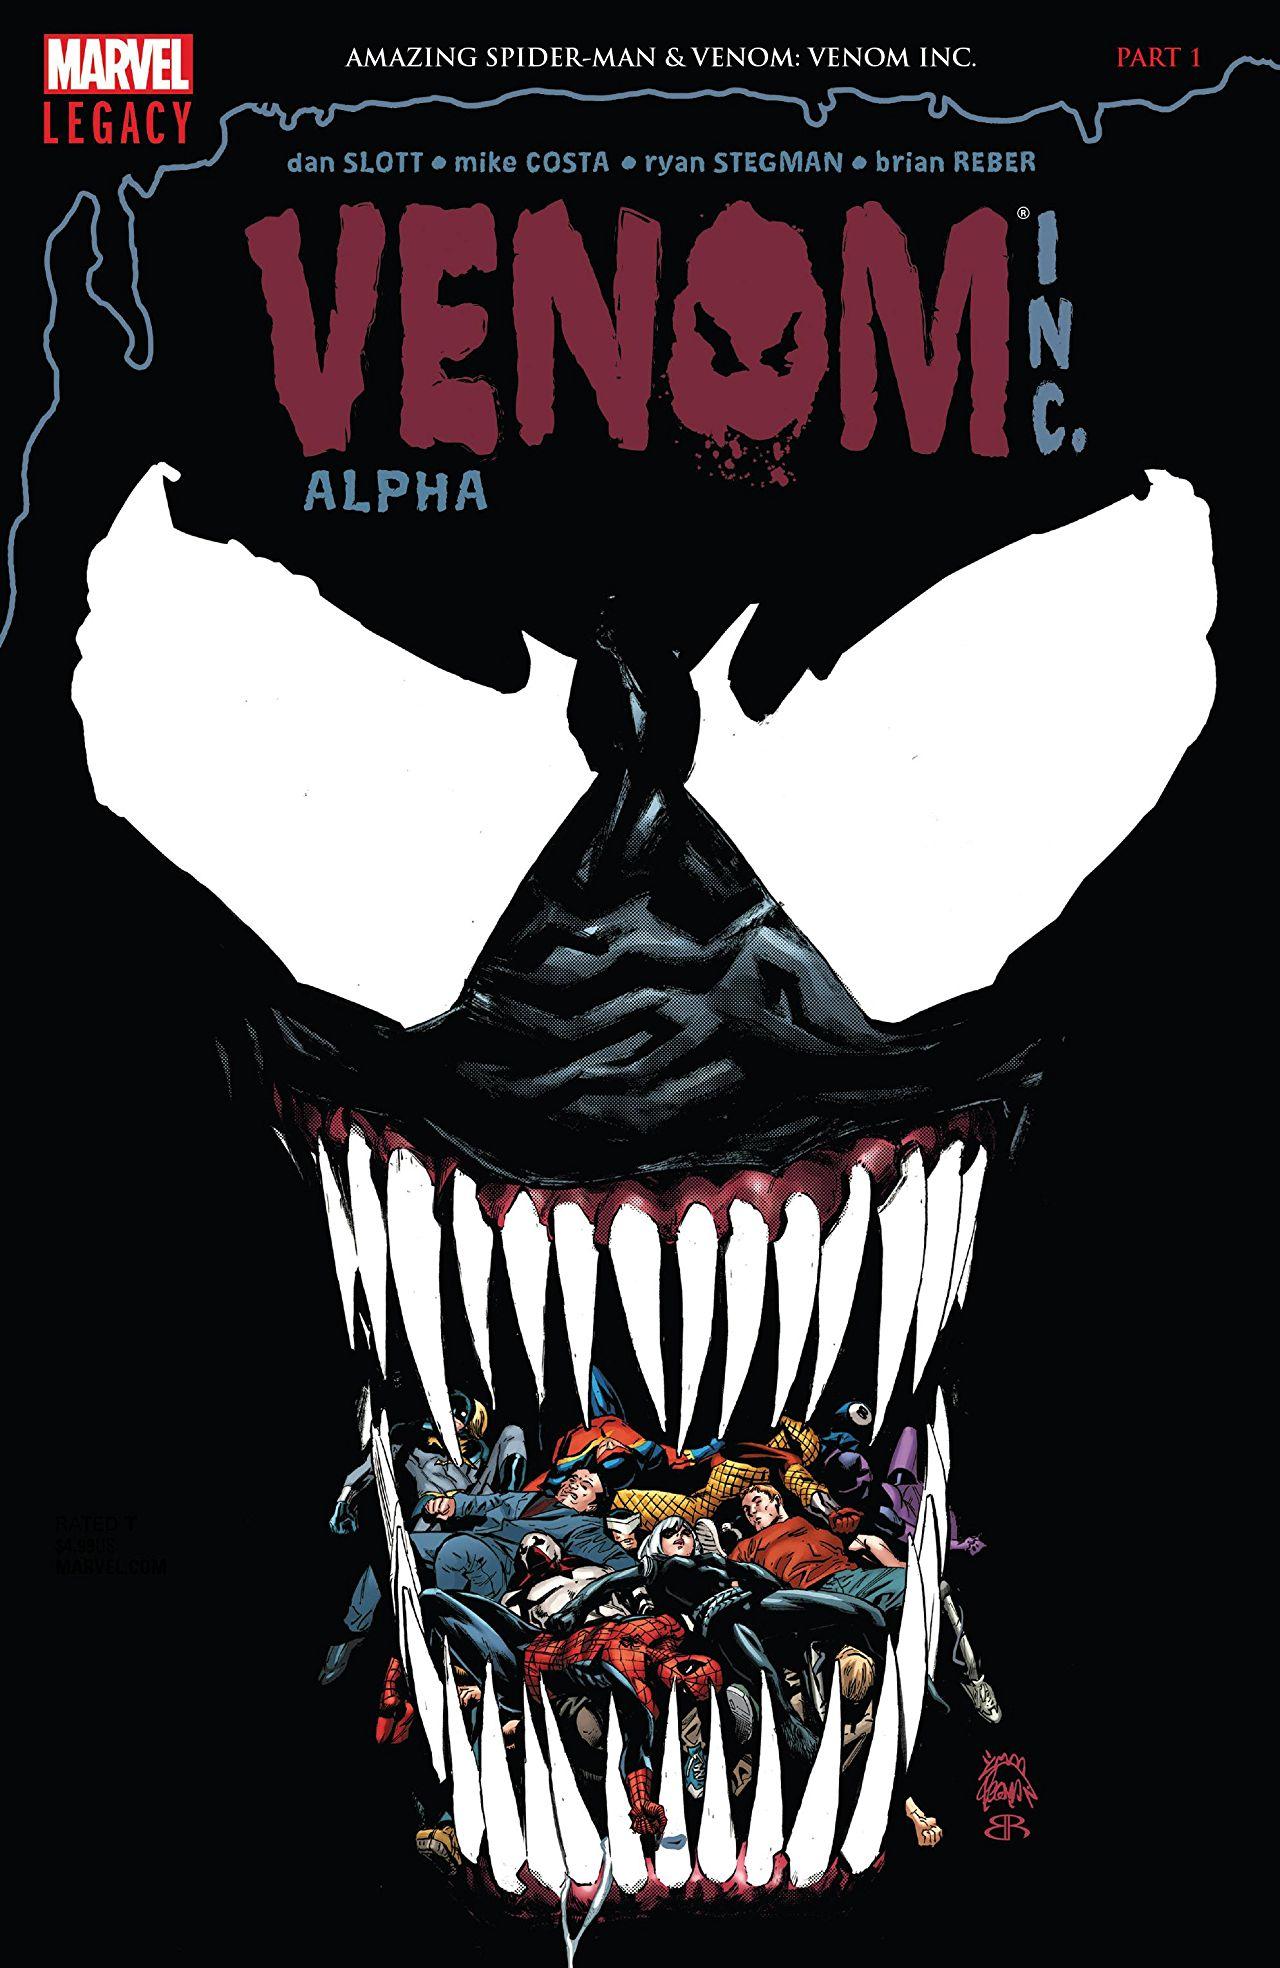 Amazing Spider-Man - Venom INC. Omega 1 - Alpha